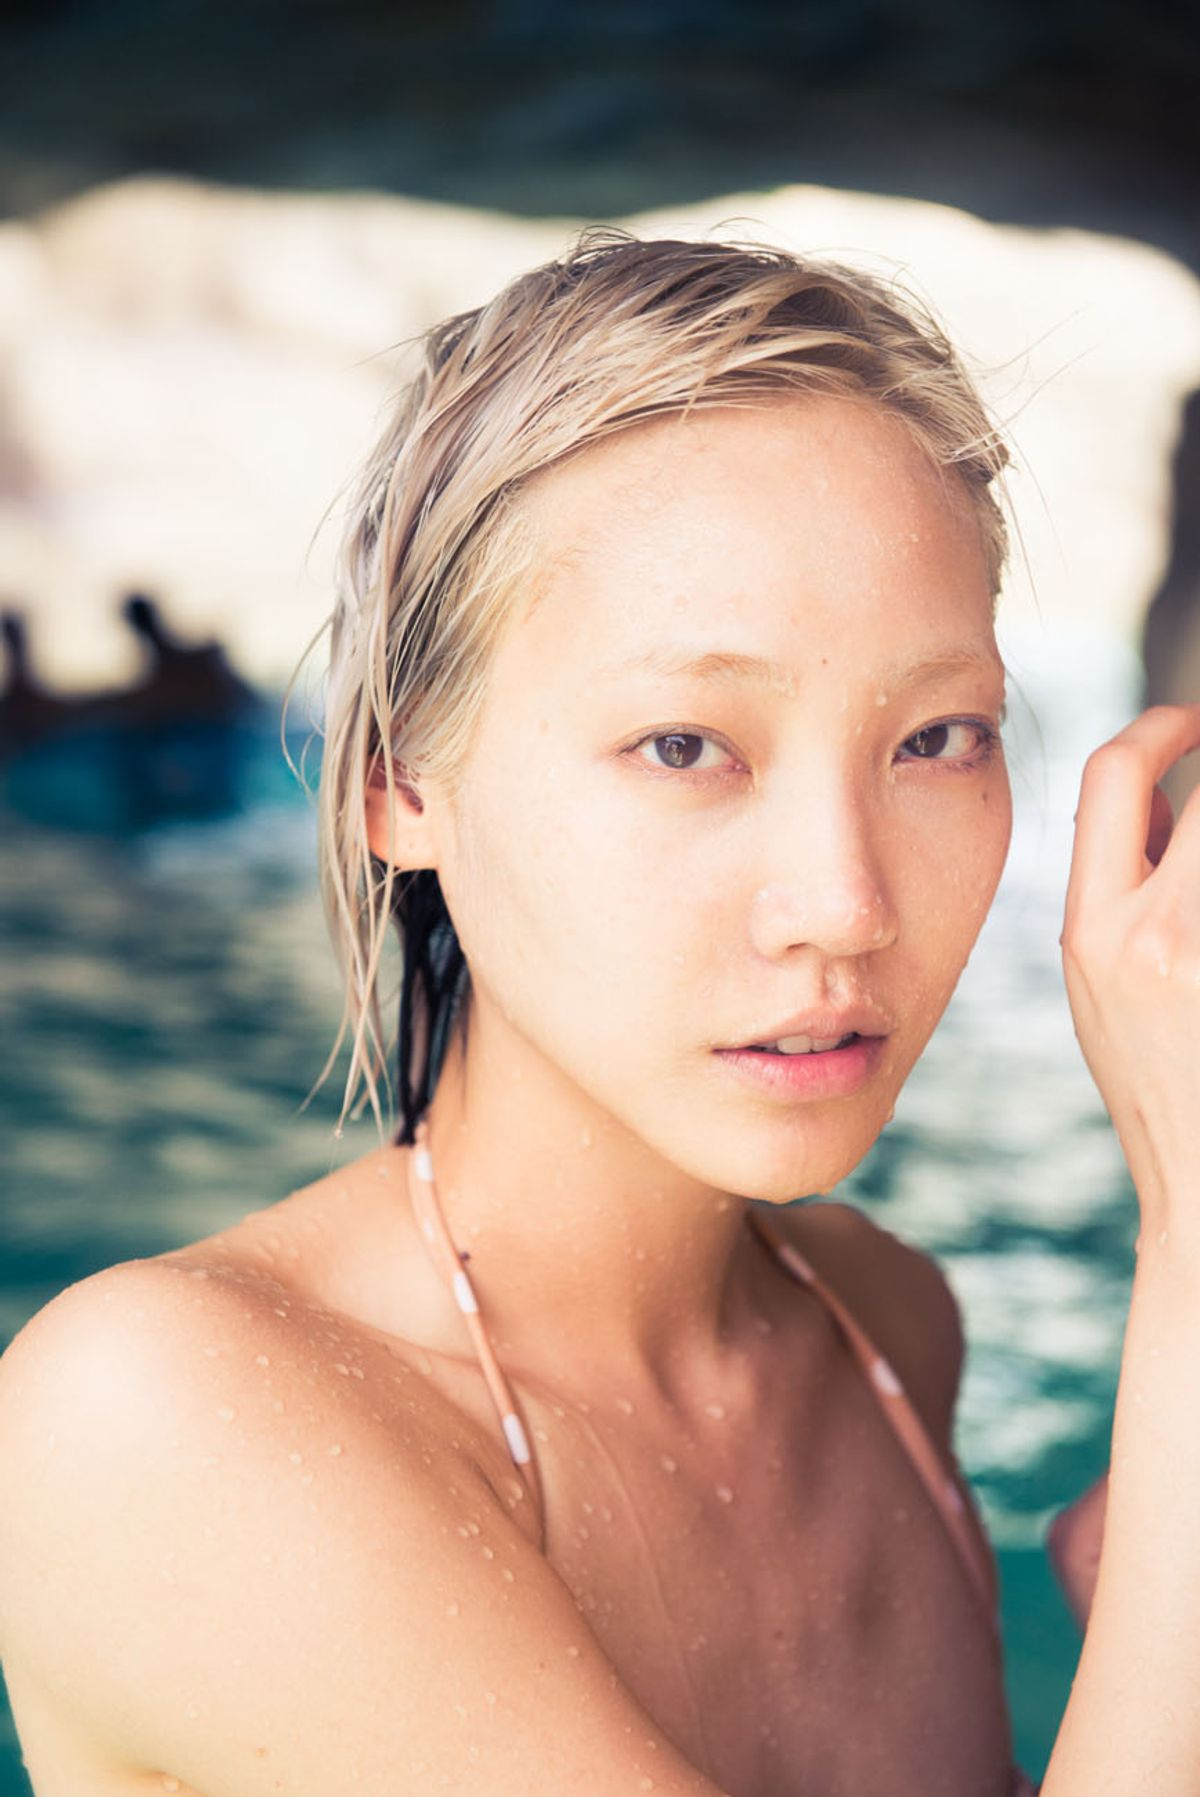 Swimming with Soo Joo